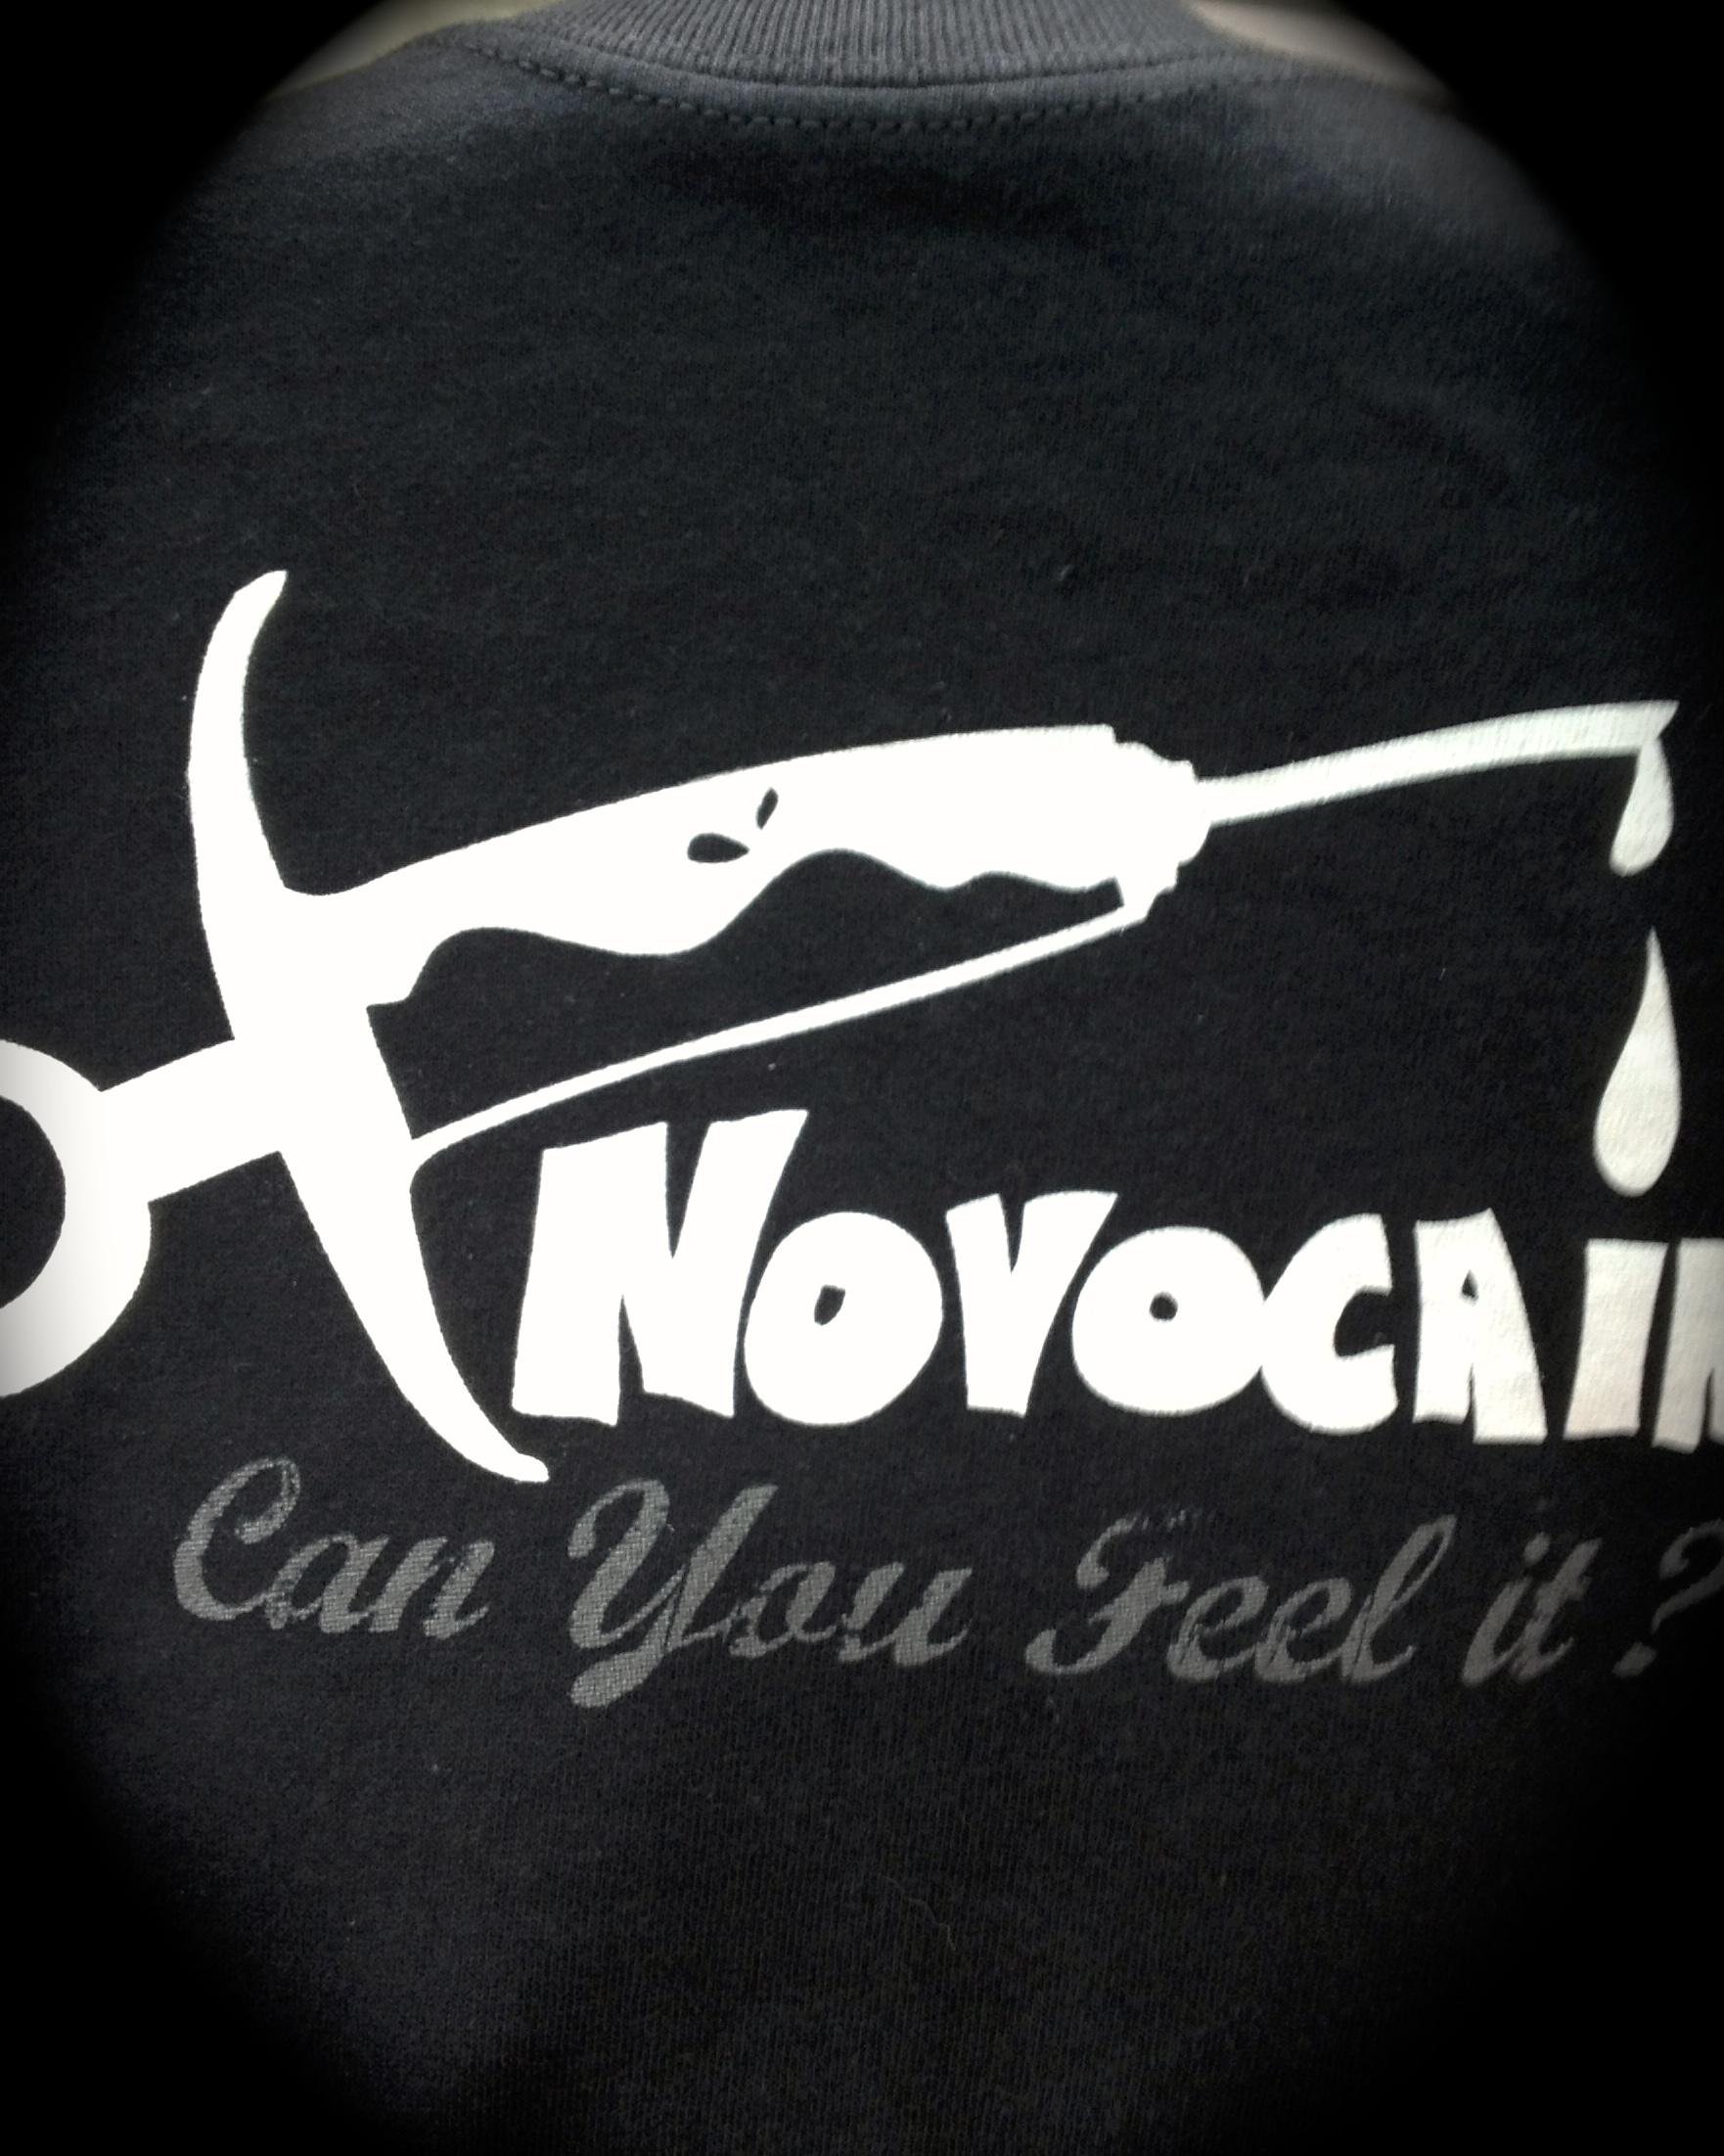 Need more Novocaine?